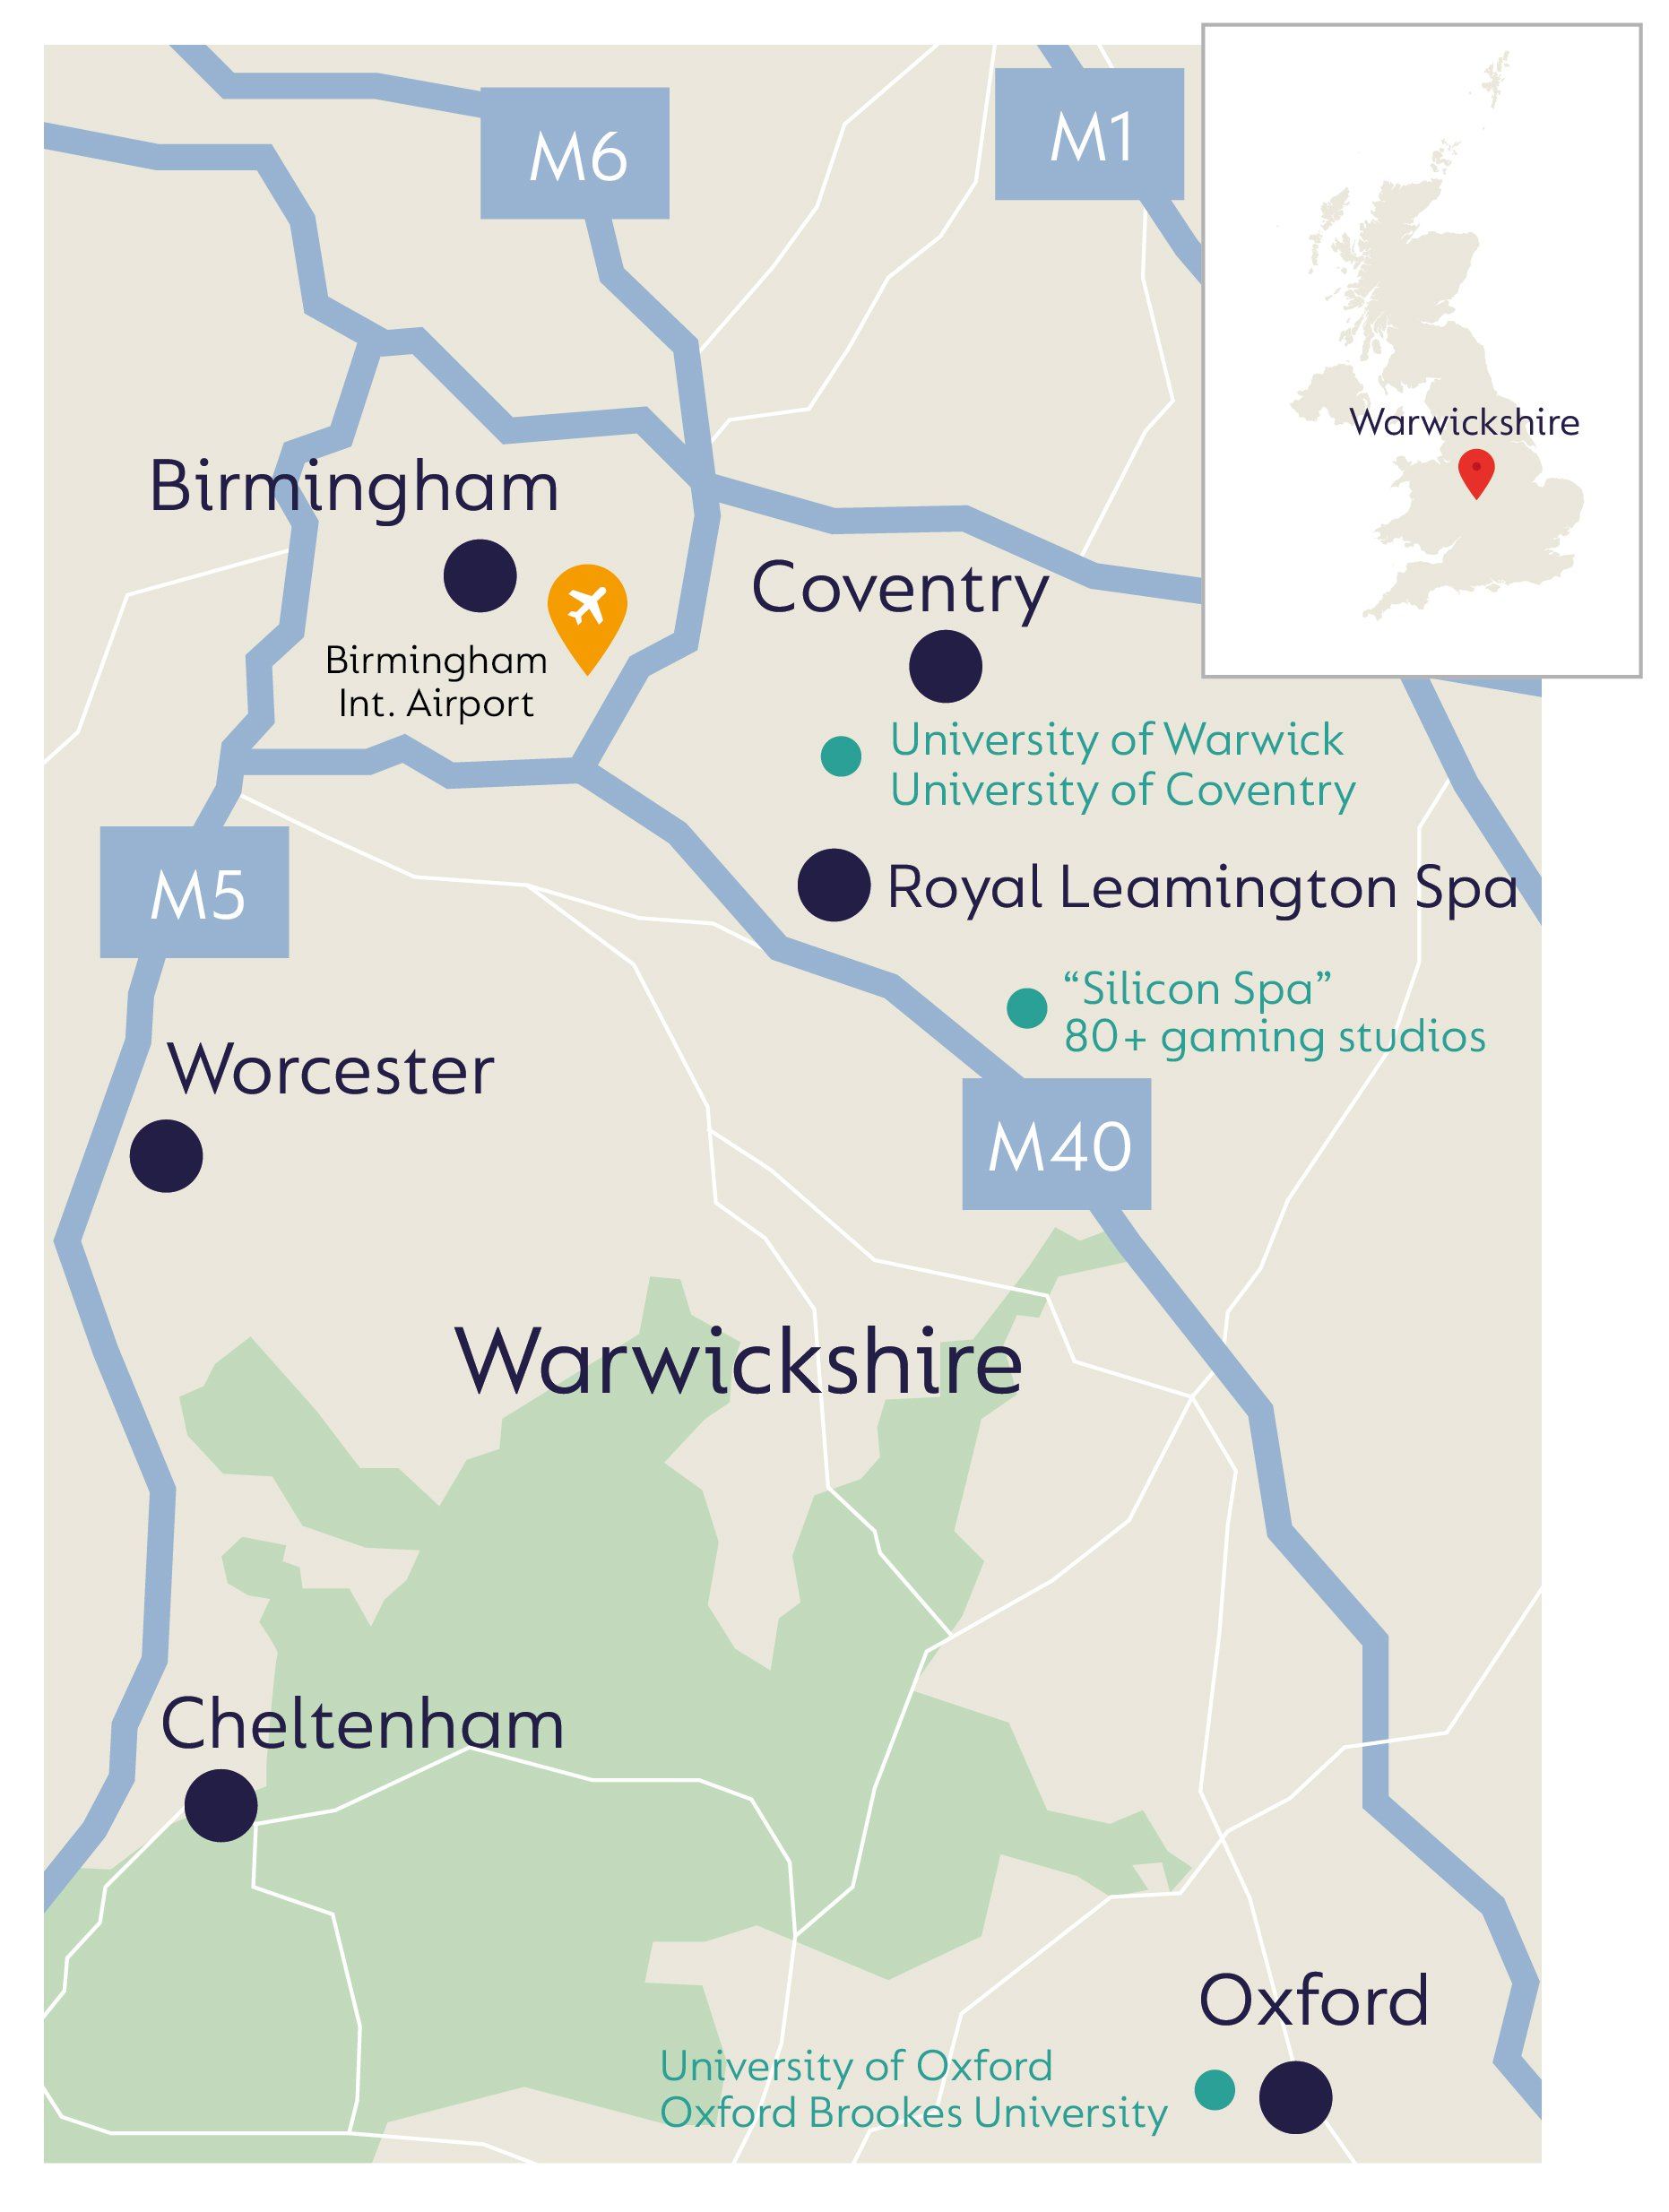 03_Map_Warwickshire_Video_Games.jpg